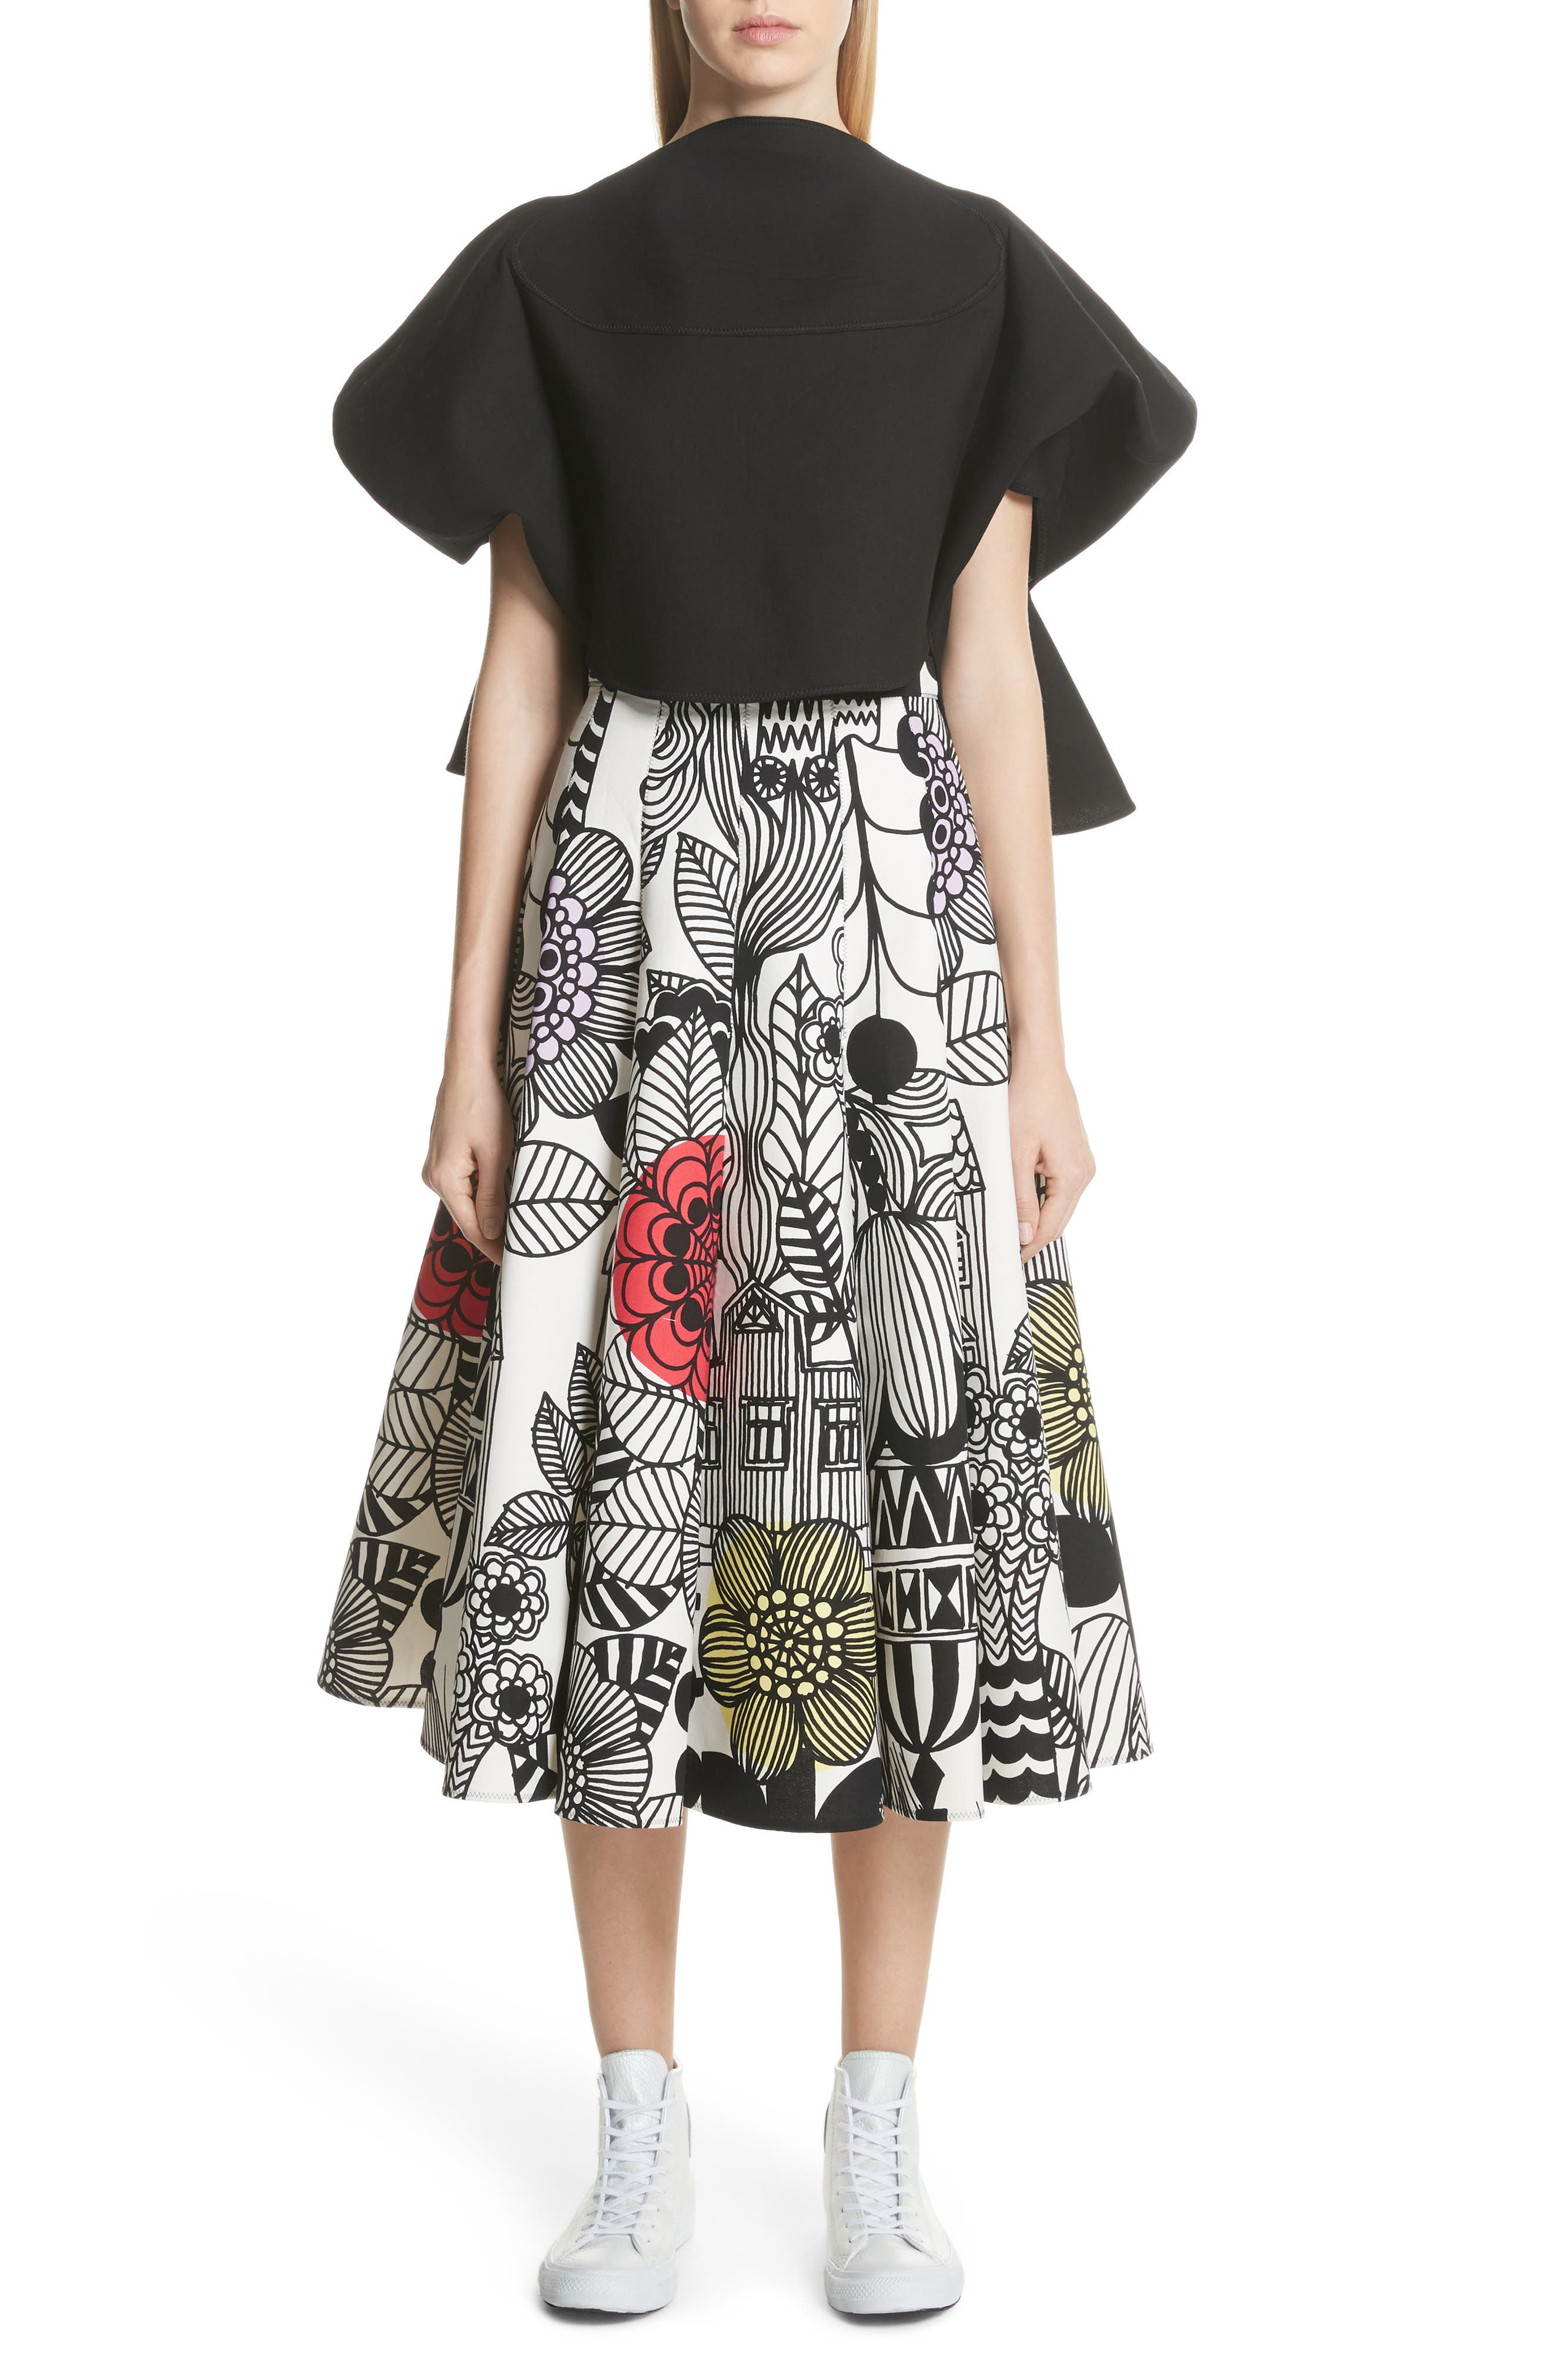 x Marimekko Vegetable Print Cotton Skirt,                             Alternate thumbnail 8, color,                             Wht/ Blk/ Ylw